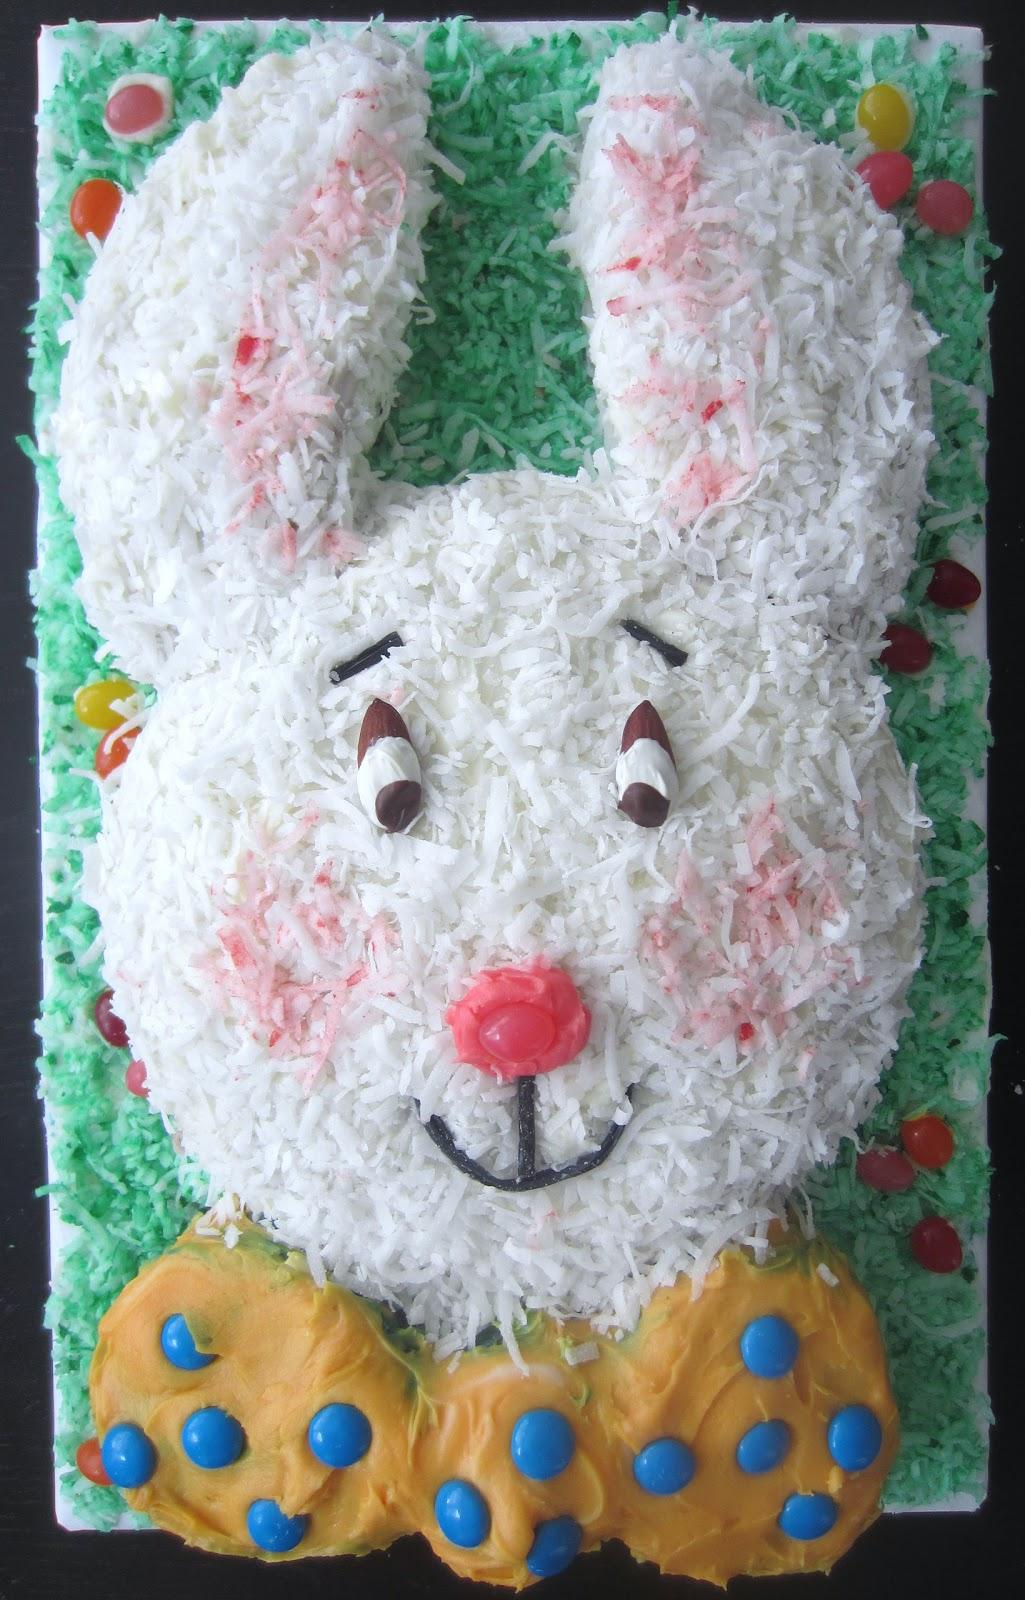 Easter-Bunny-Cake -wonderfuldiy6